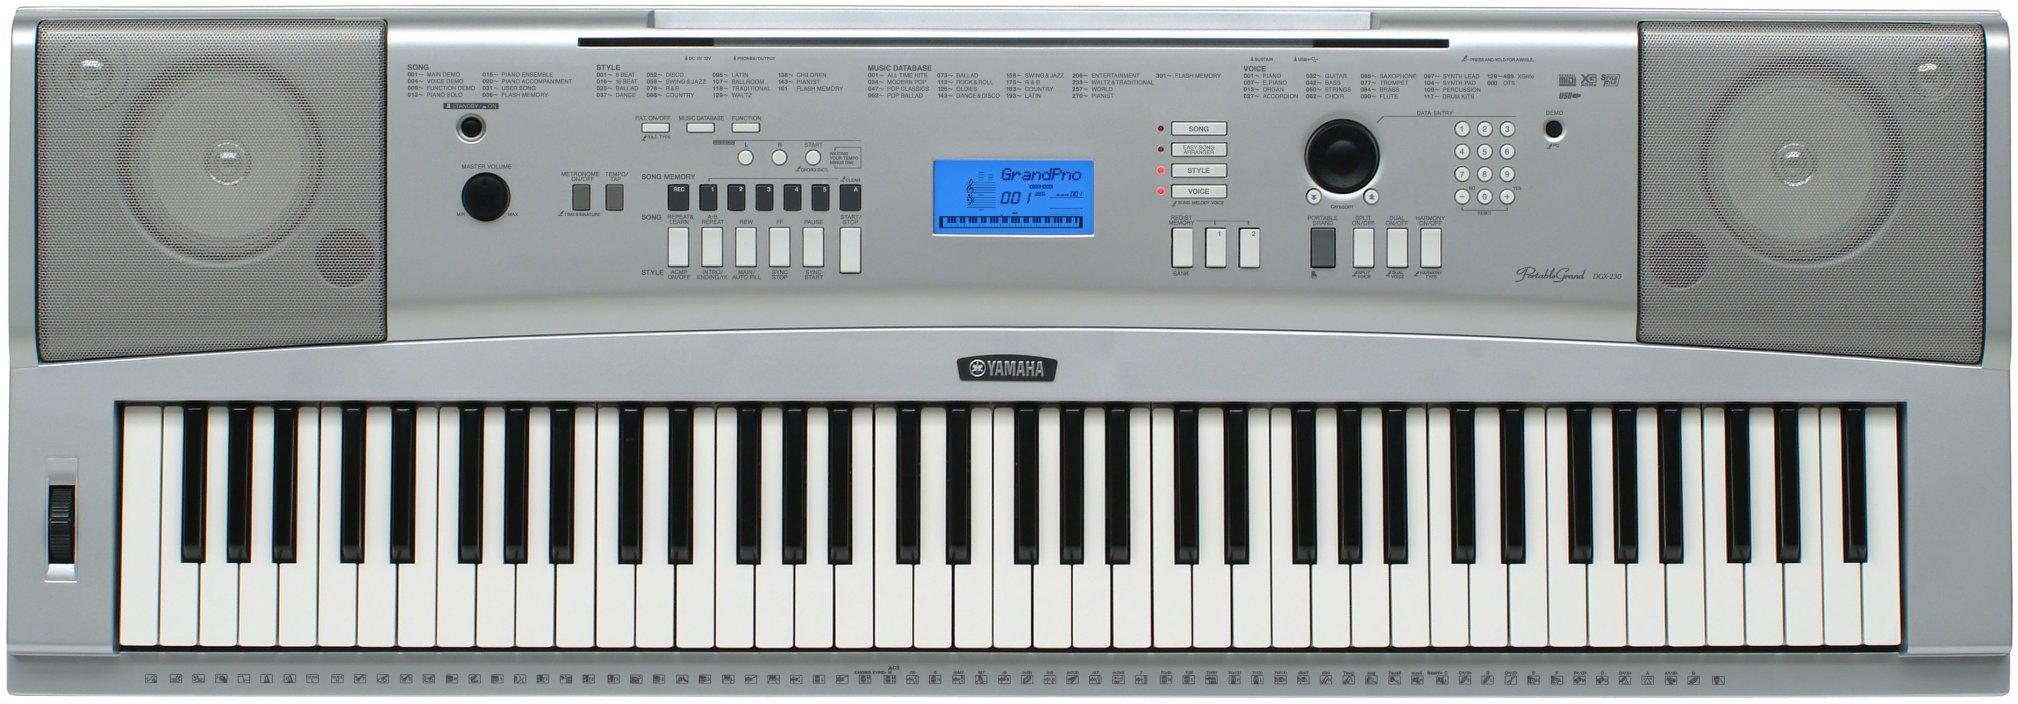 Galleon yamaha dgx230 76 key digital piano pack with for Yamaha digital piano philippines